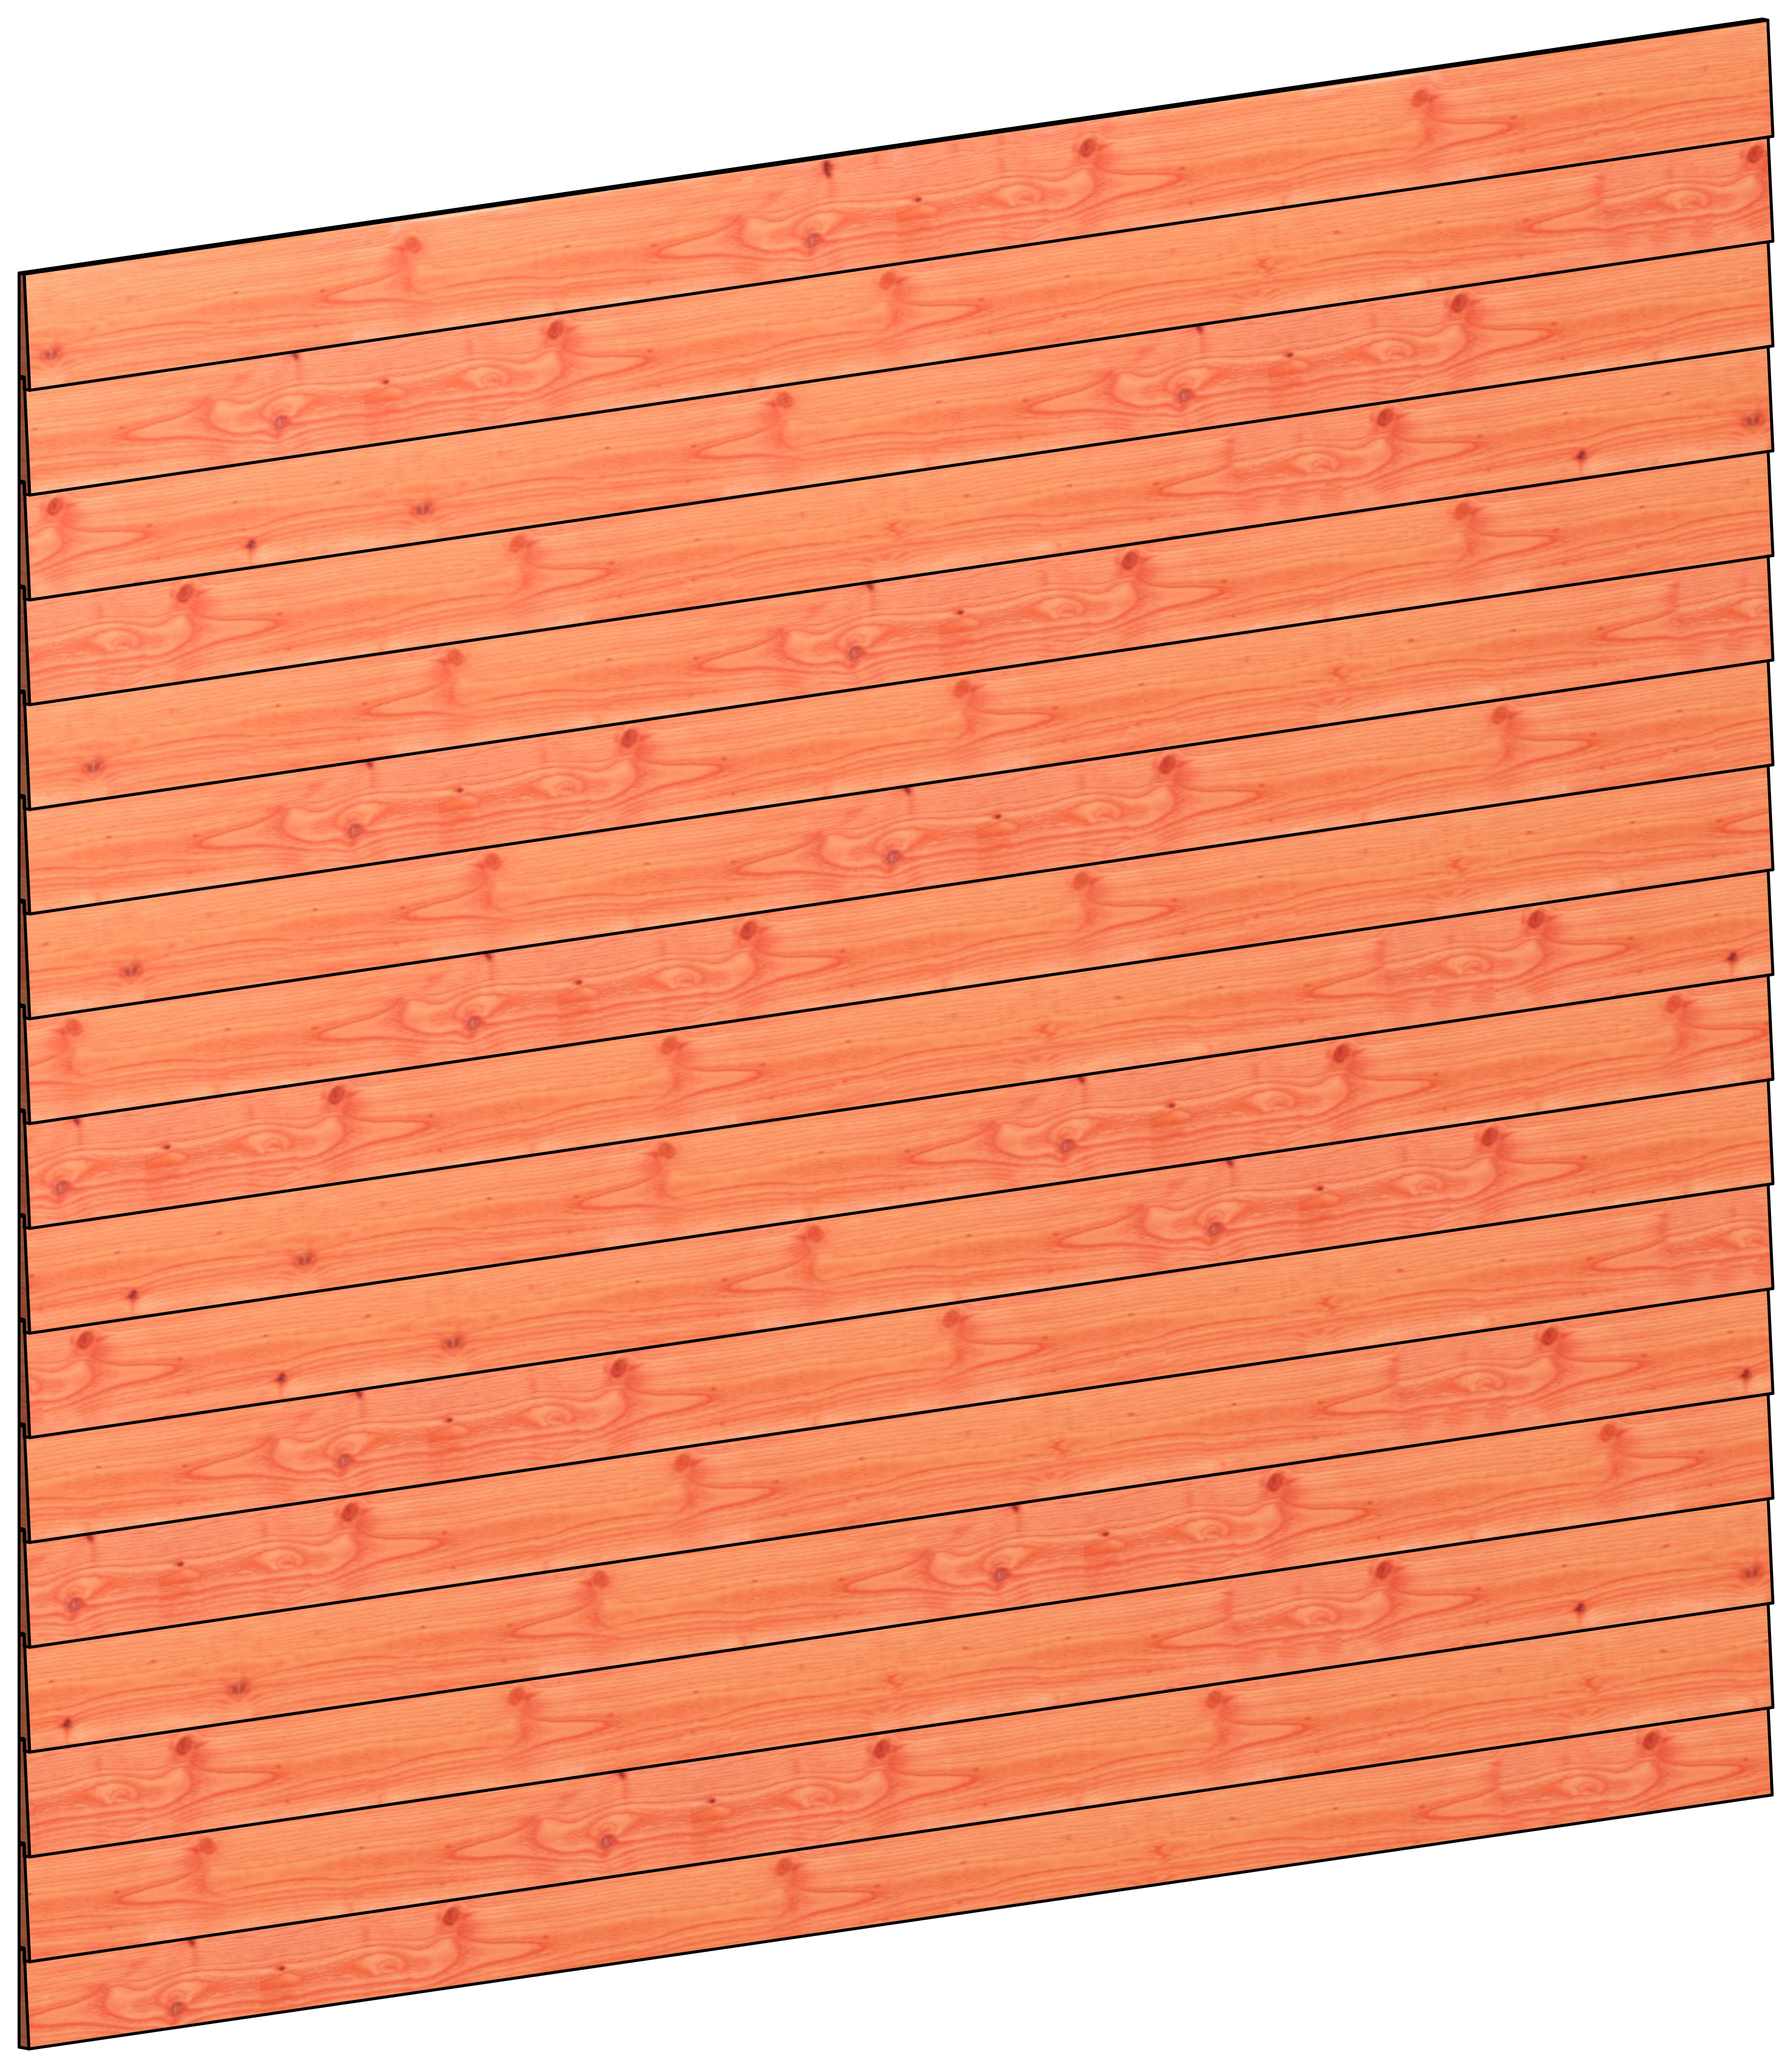 Trendhout | Wandmodule C potdekselplanken | 276x220 cm